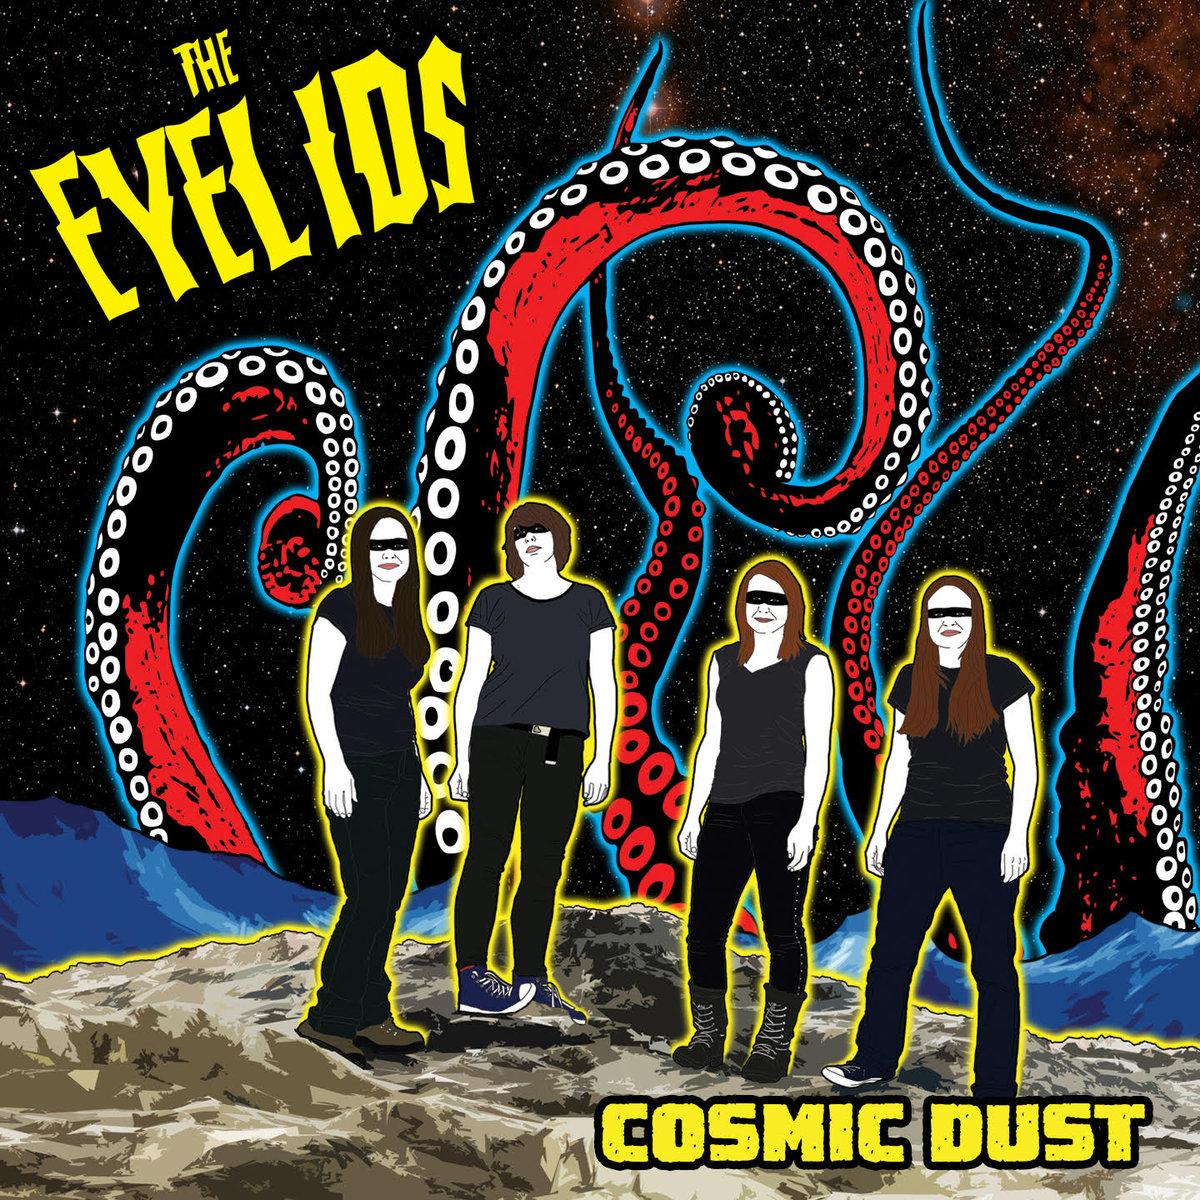 The Eyelids - Cosmic Dust